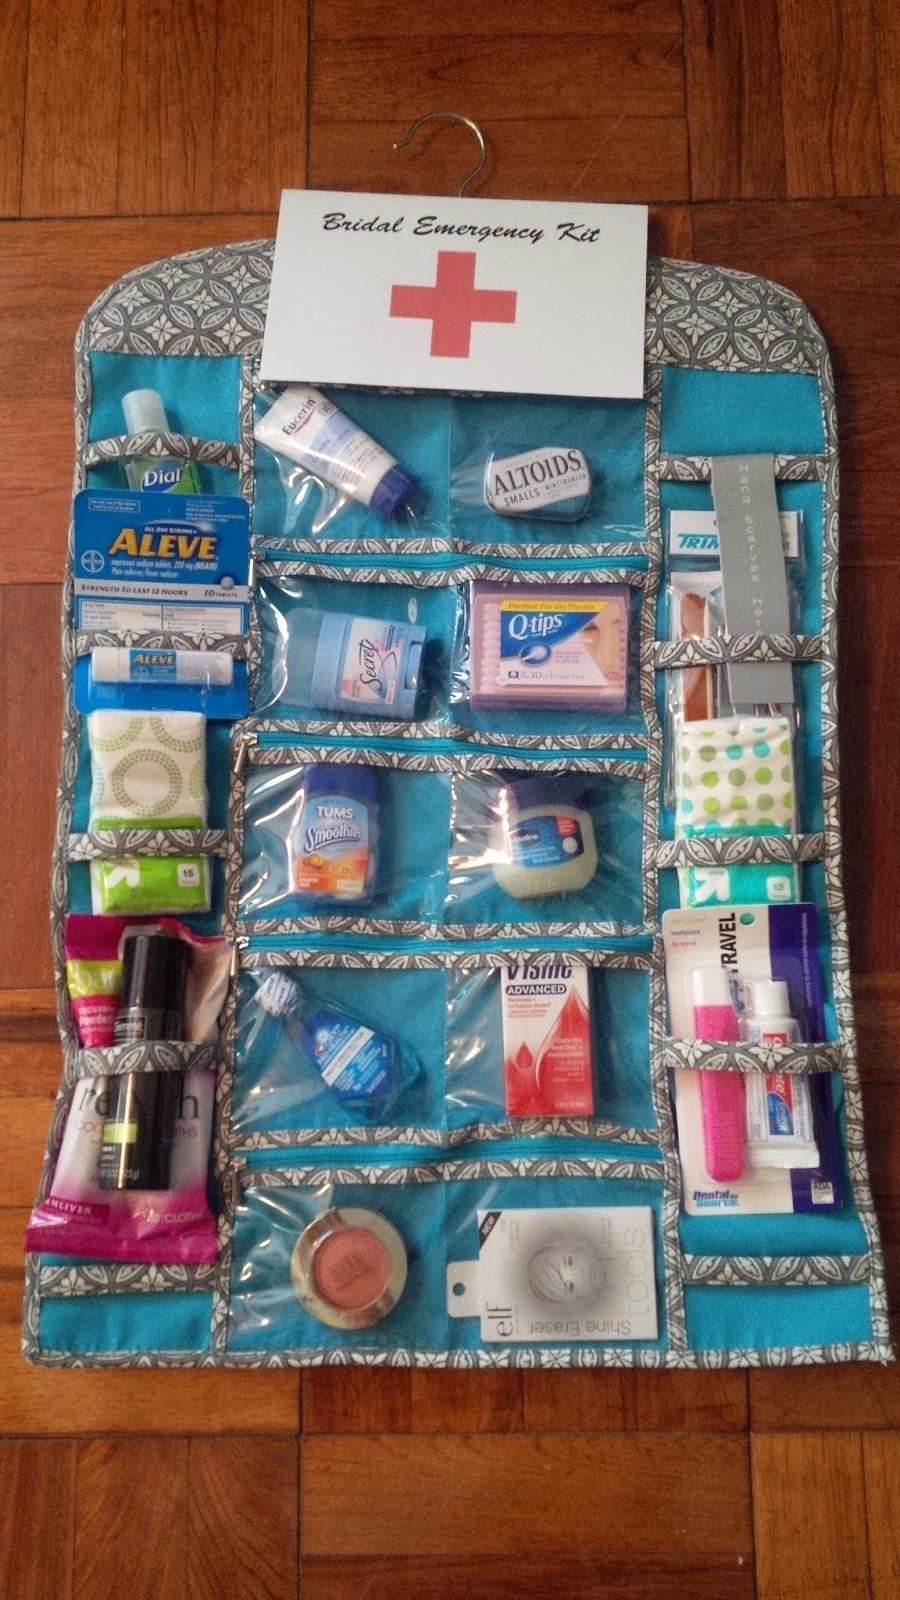 DIY Bachelorette Gift For Bride  e Thrifty Space DIY Fun Bachelorette Gift